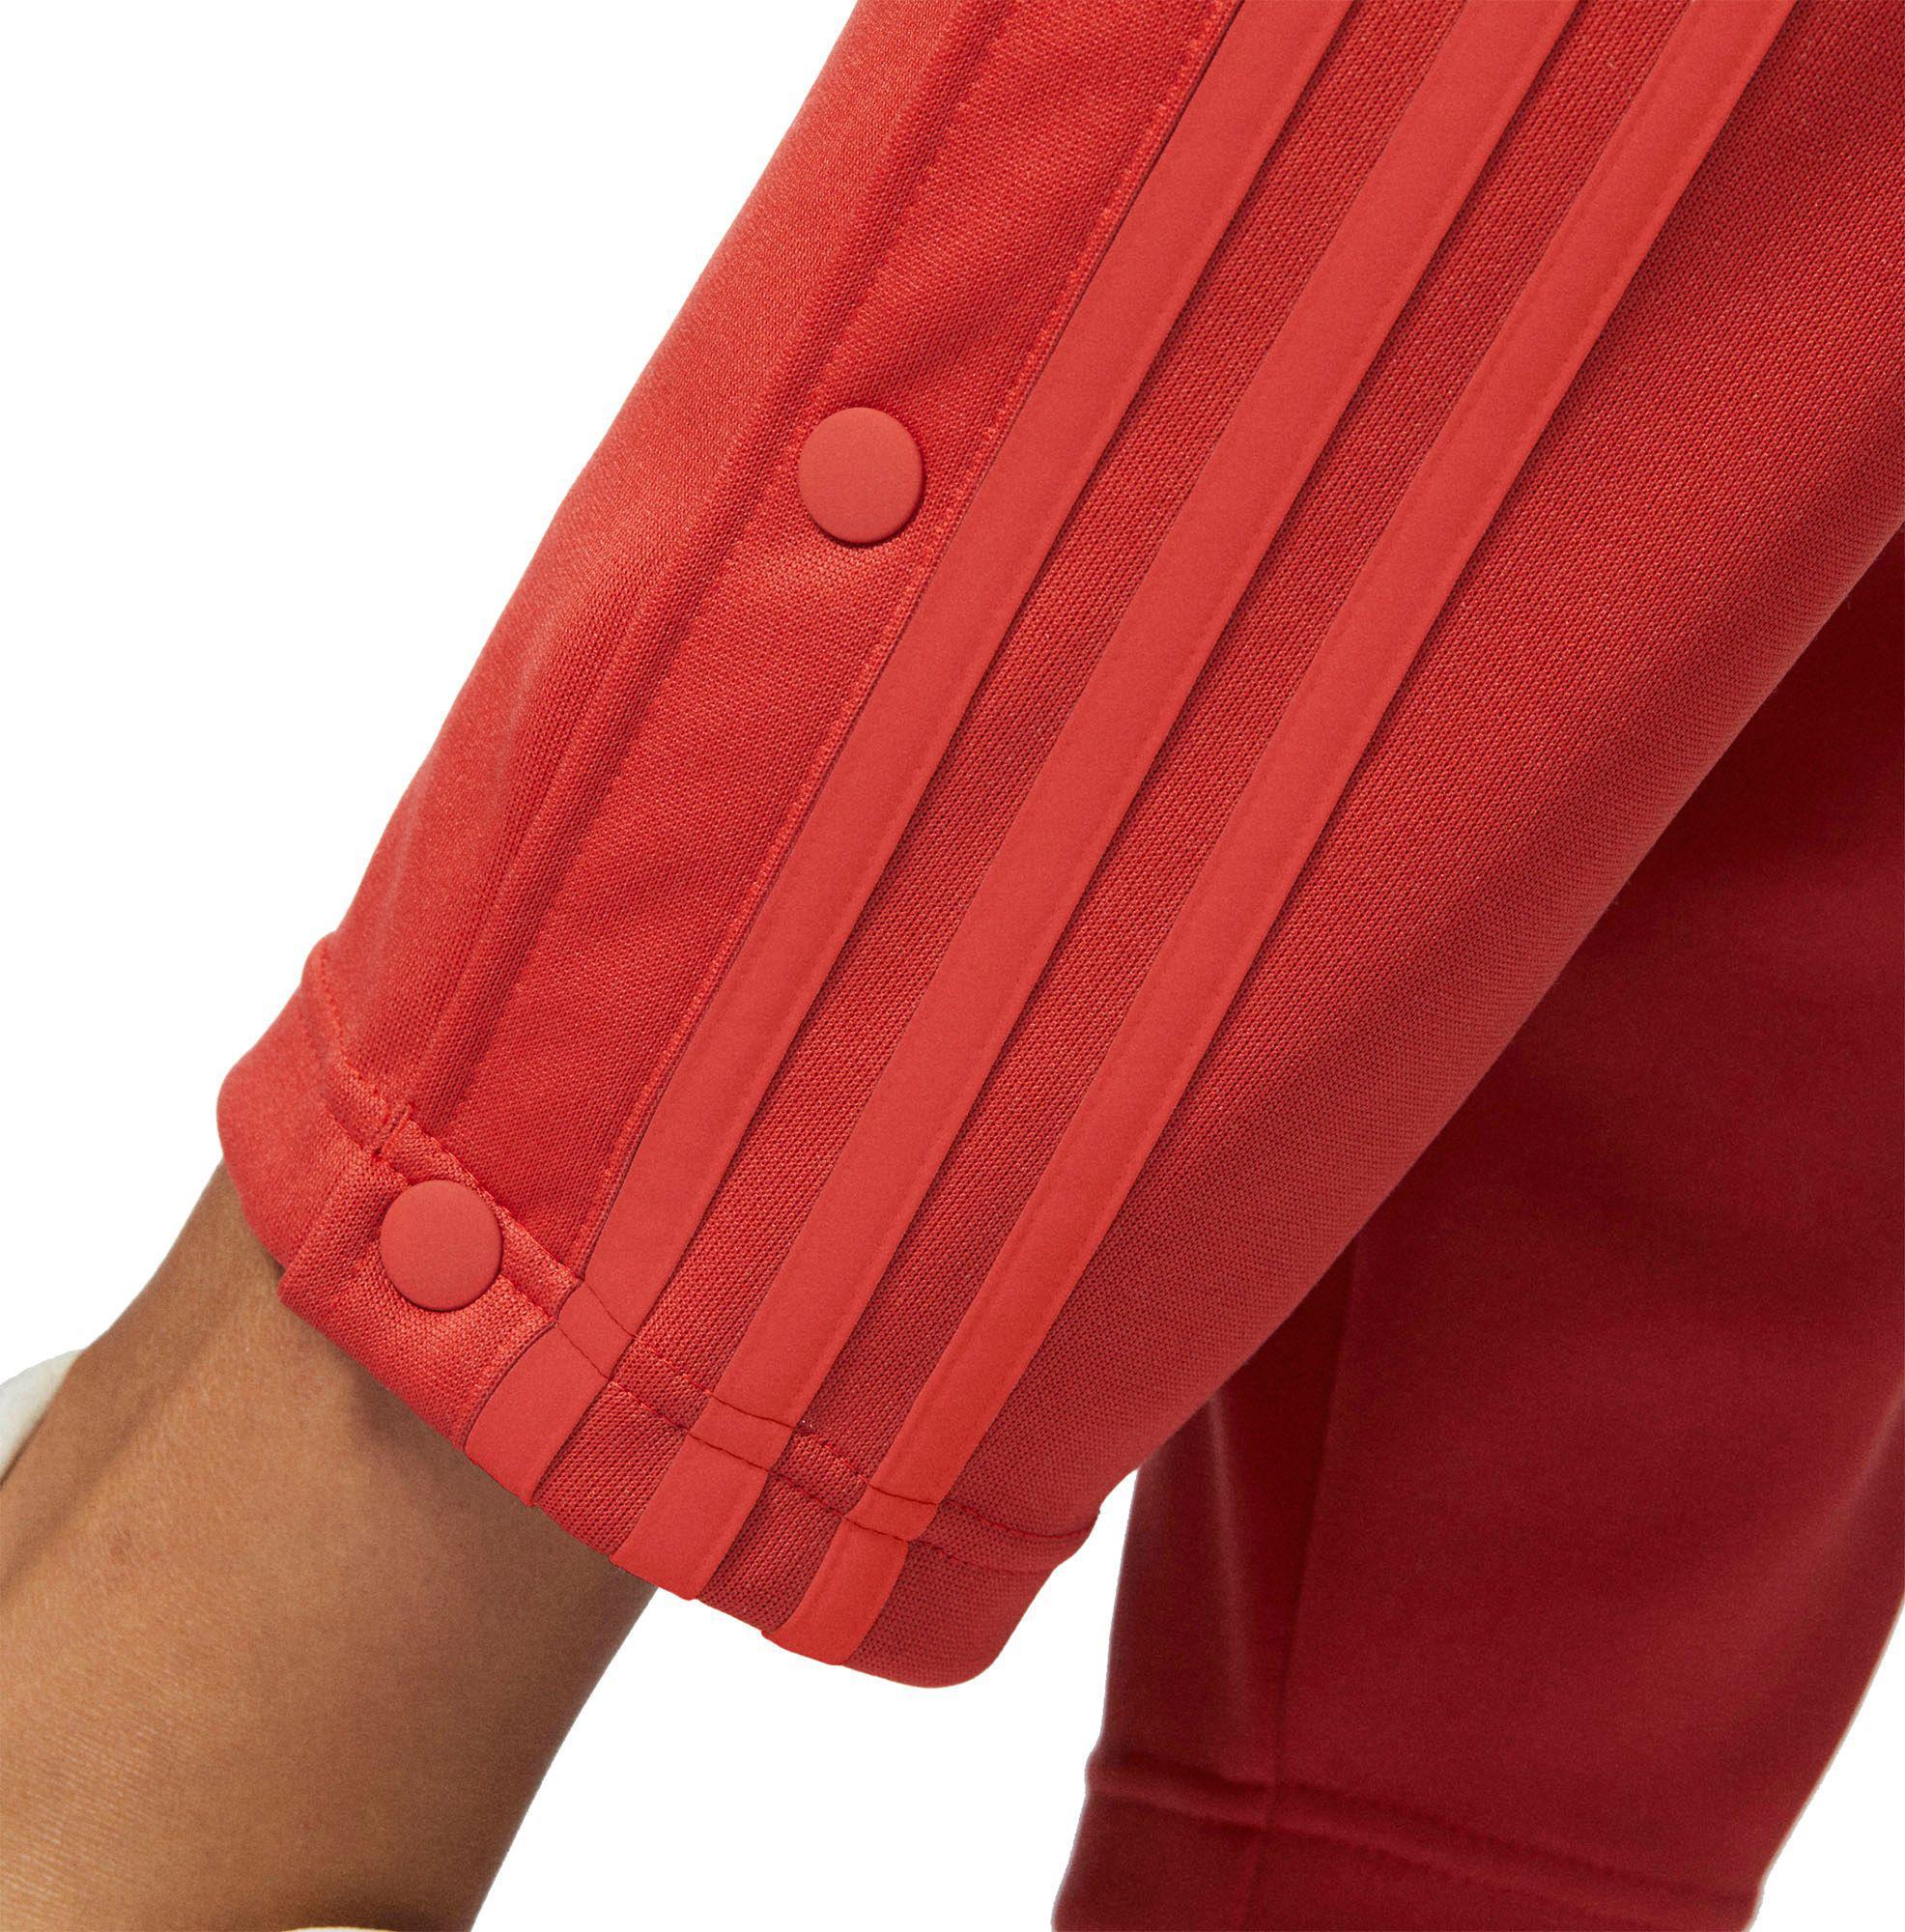 Lyst Adidas tricot Snap pantalones en rojo